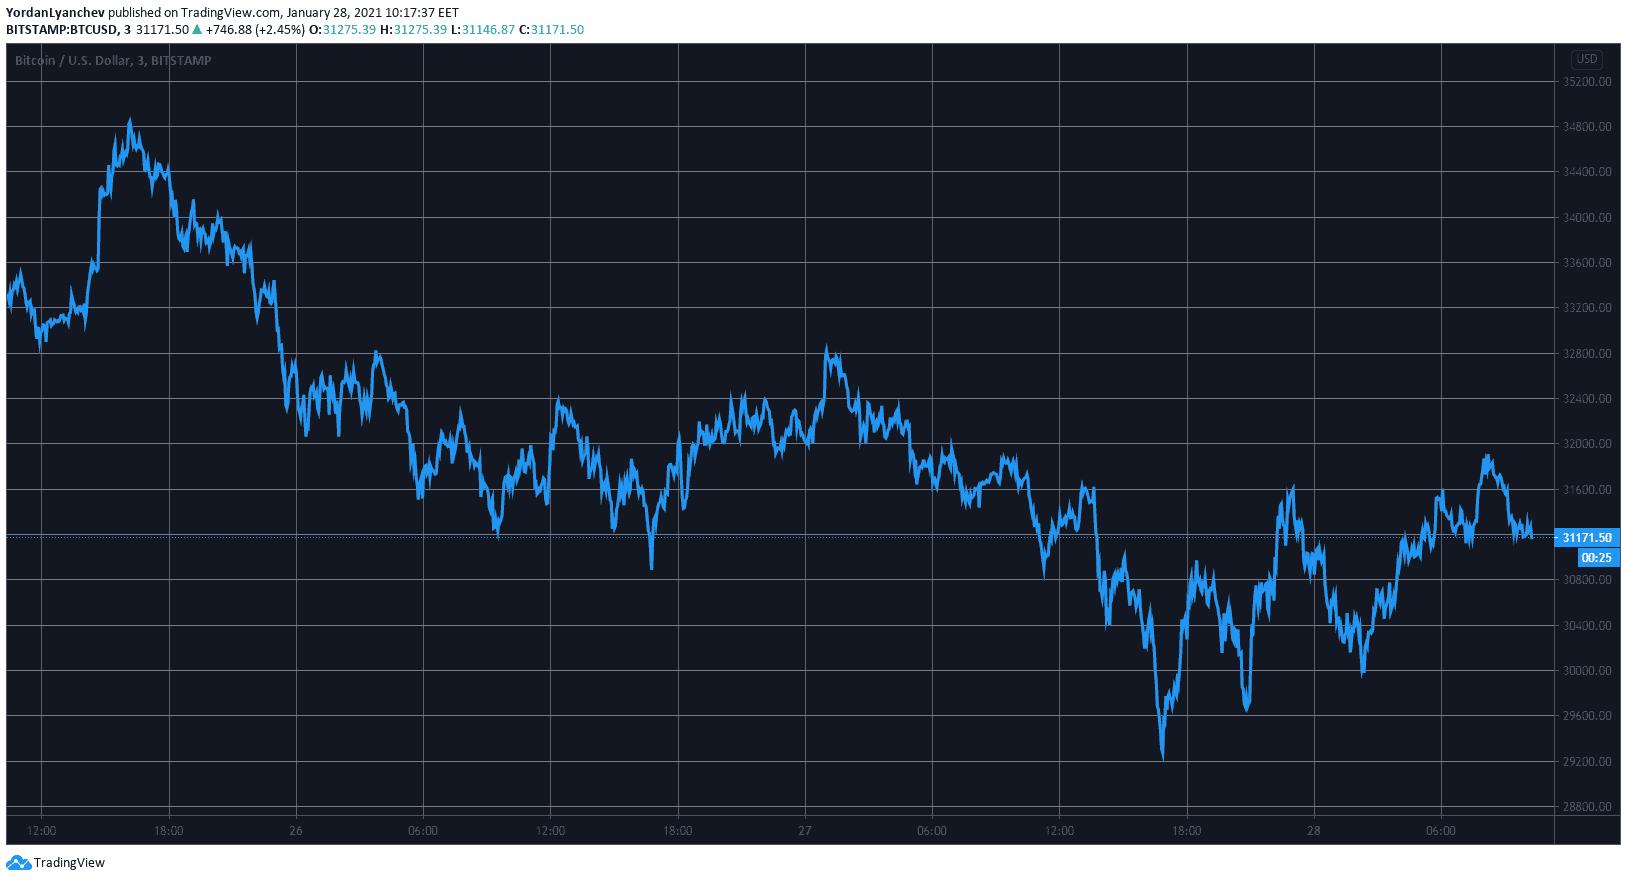 Market Watch: Despite Wall Street, Bitcoin Holds Above $30K So Far